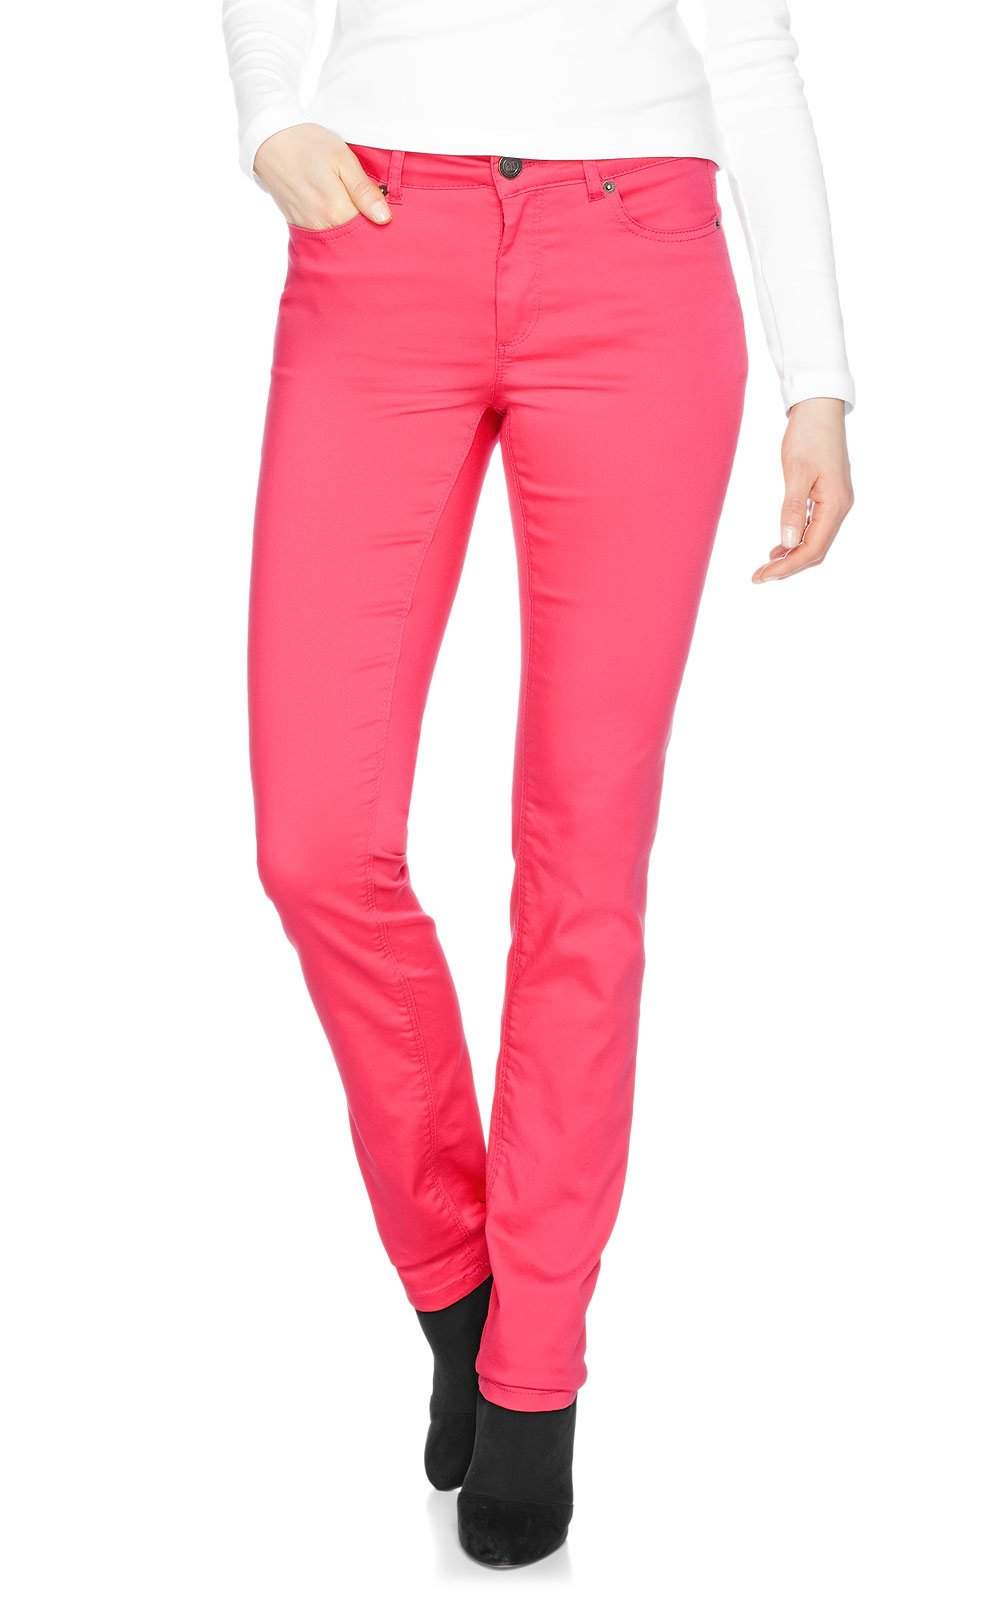 Pink i Roseteaberry l29 W645W38 s JeansSkinny Femme H TZiOPukX